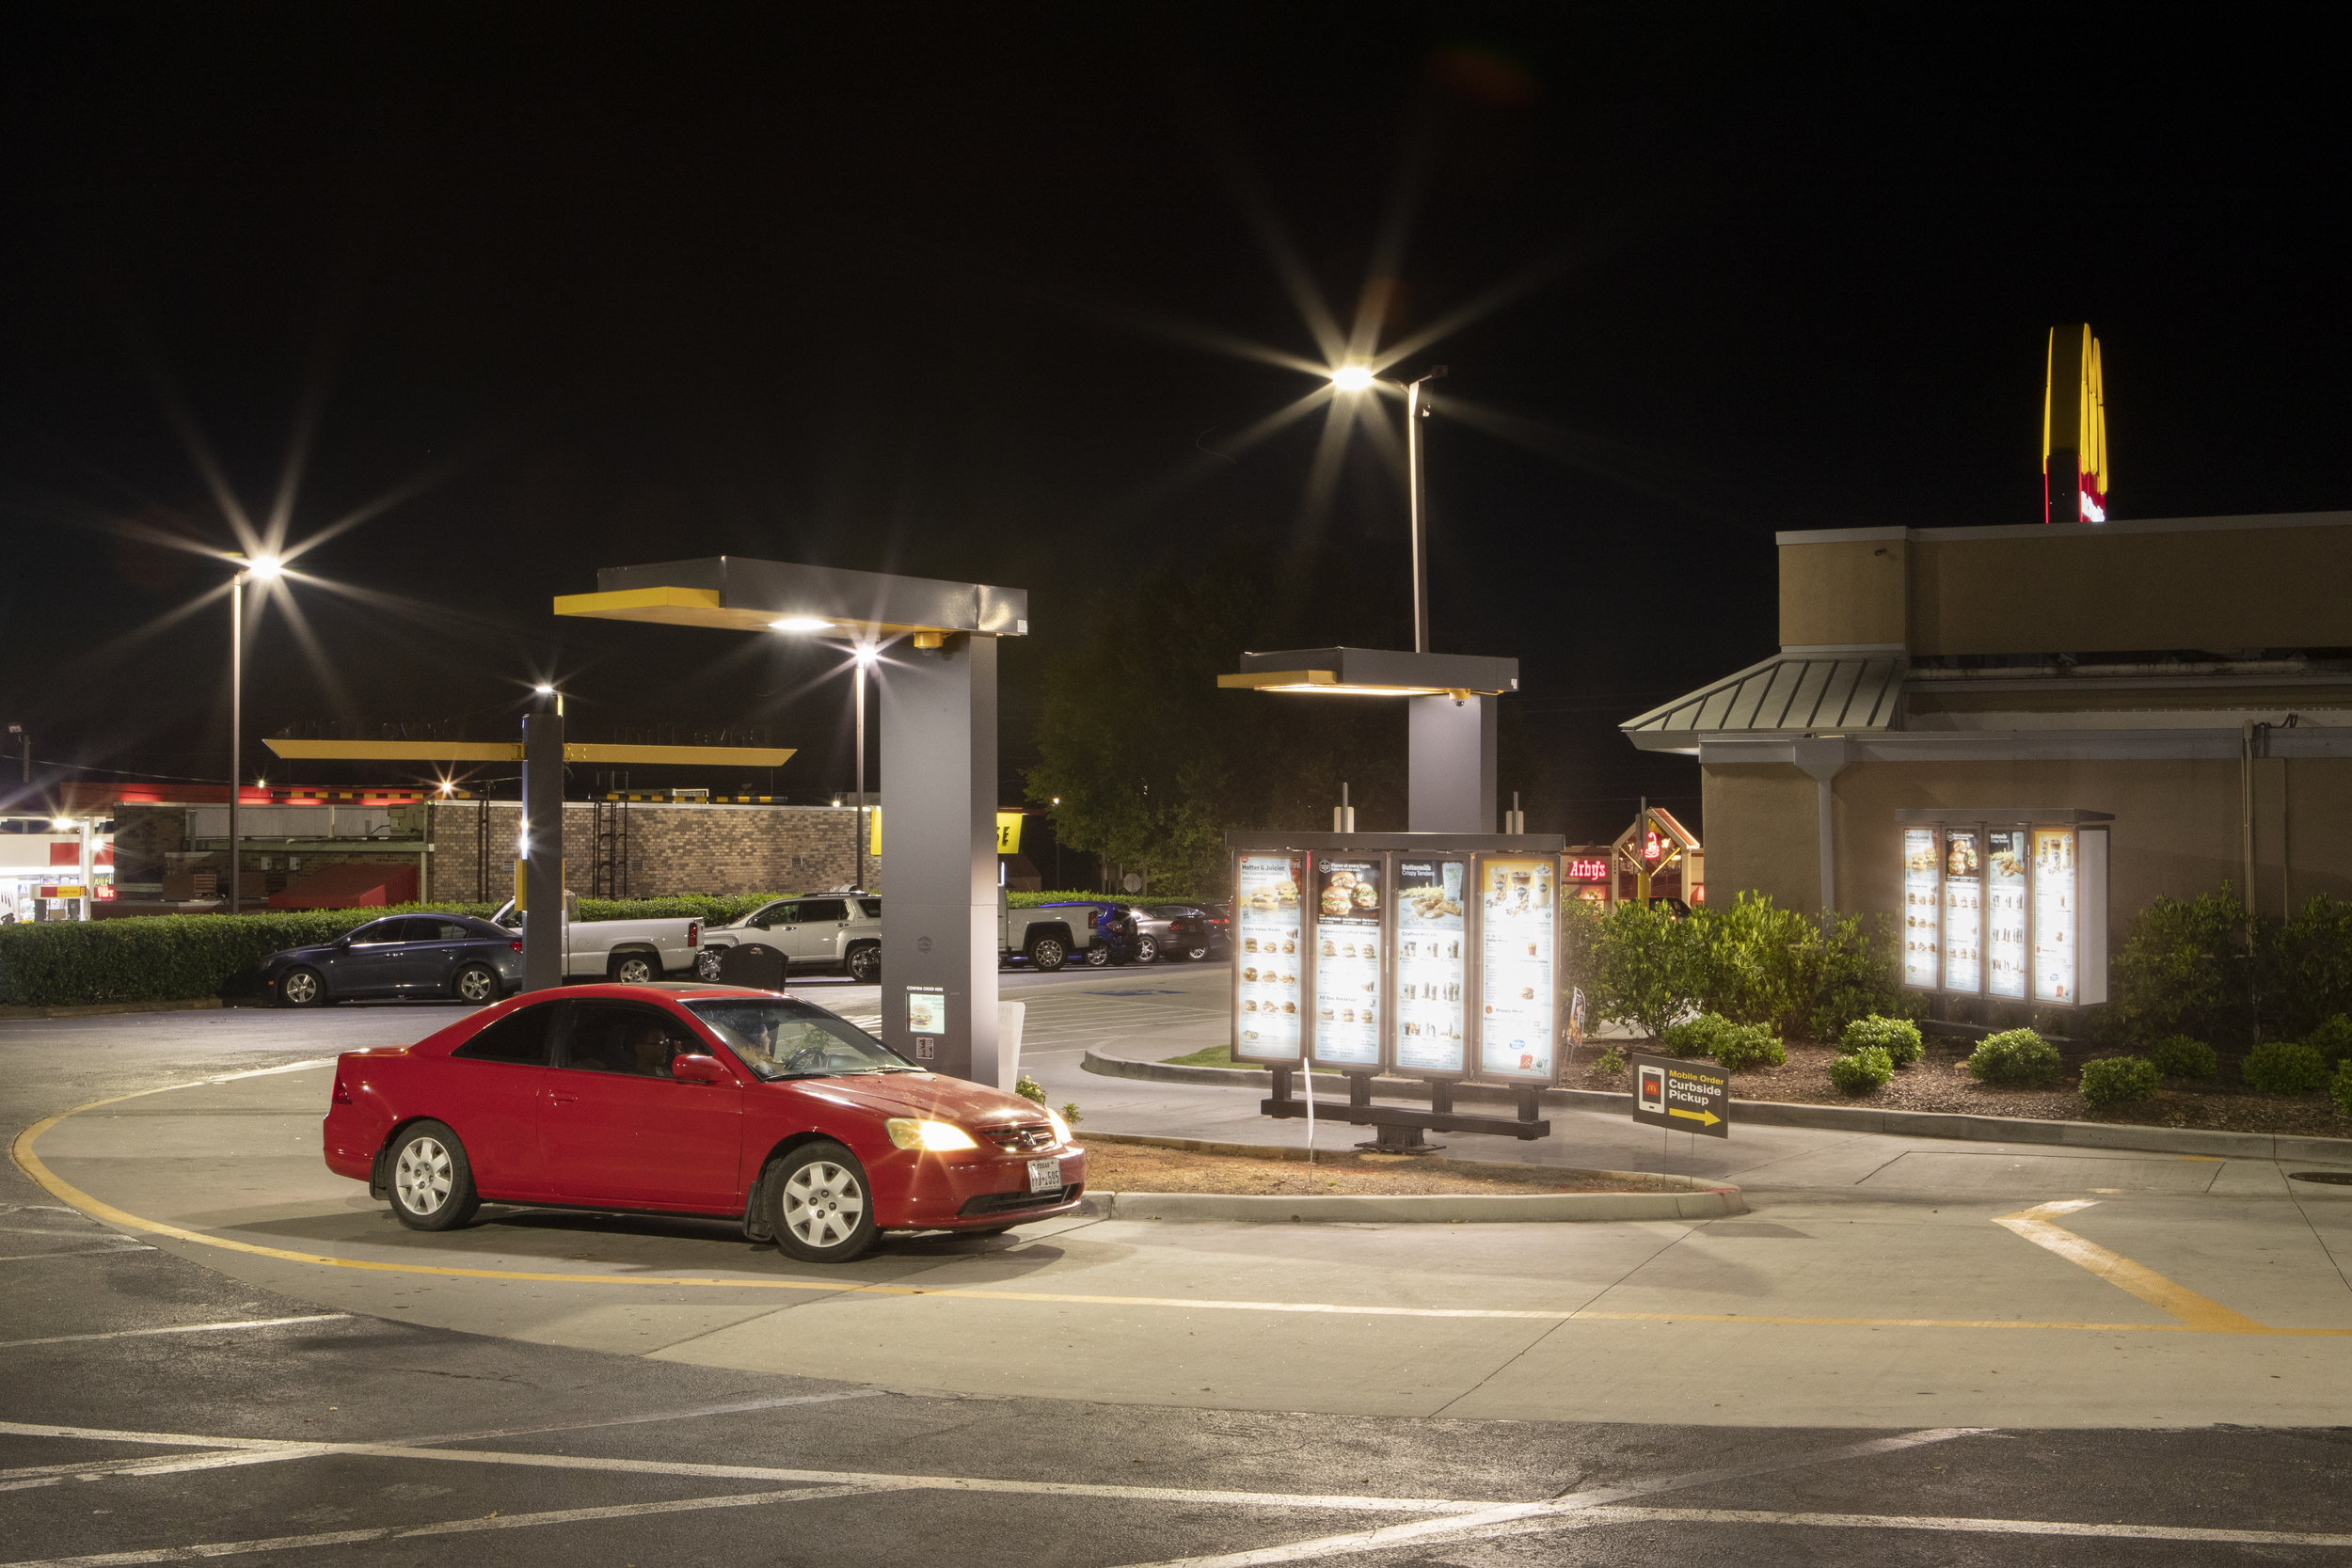 LT_McDonalds_JeffersonGA_5.jpg